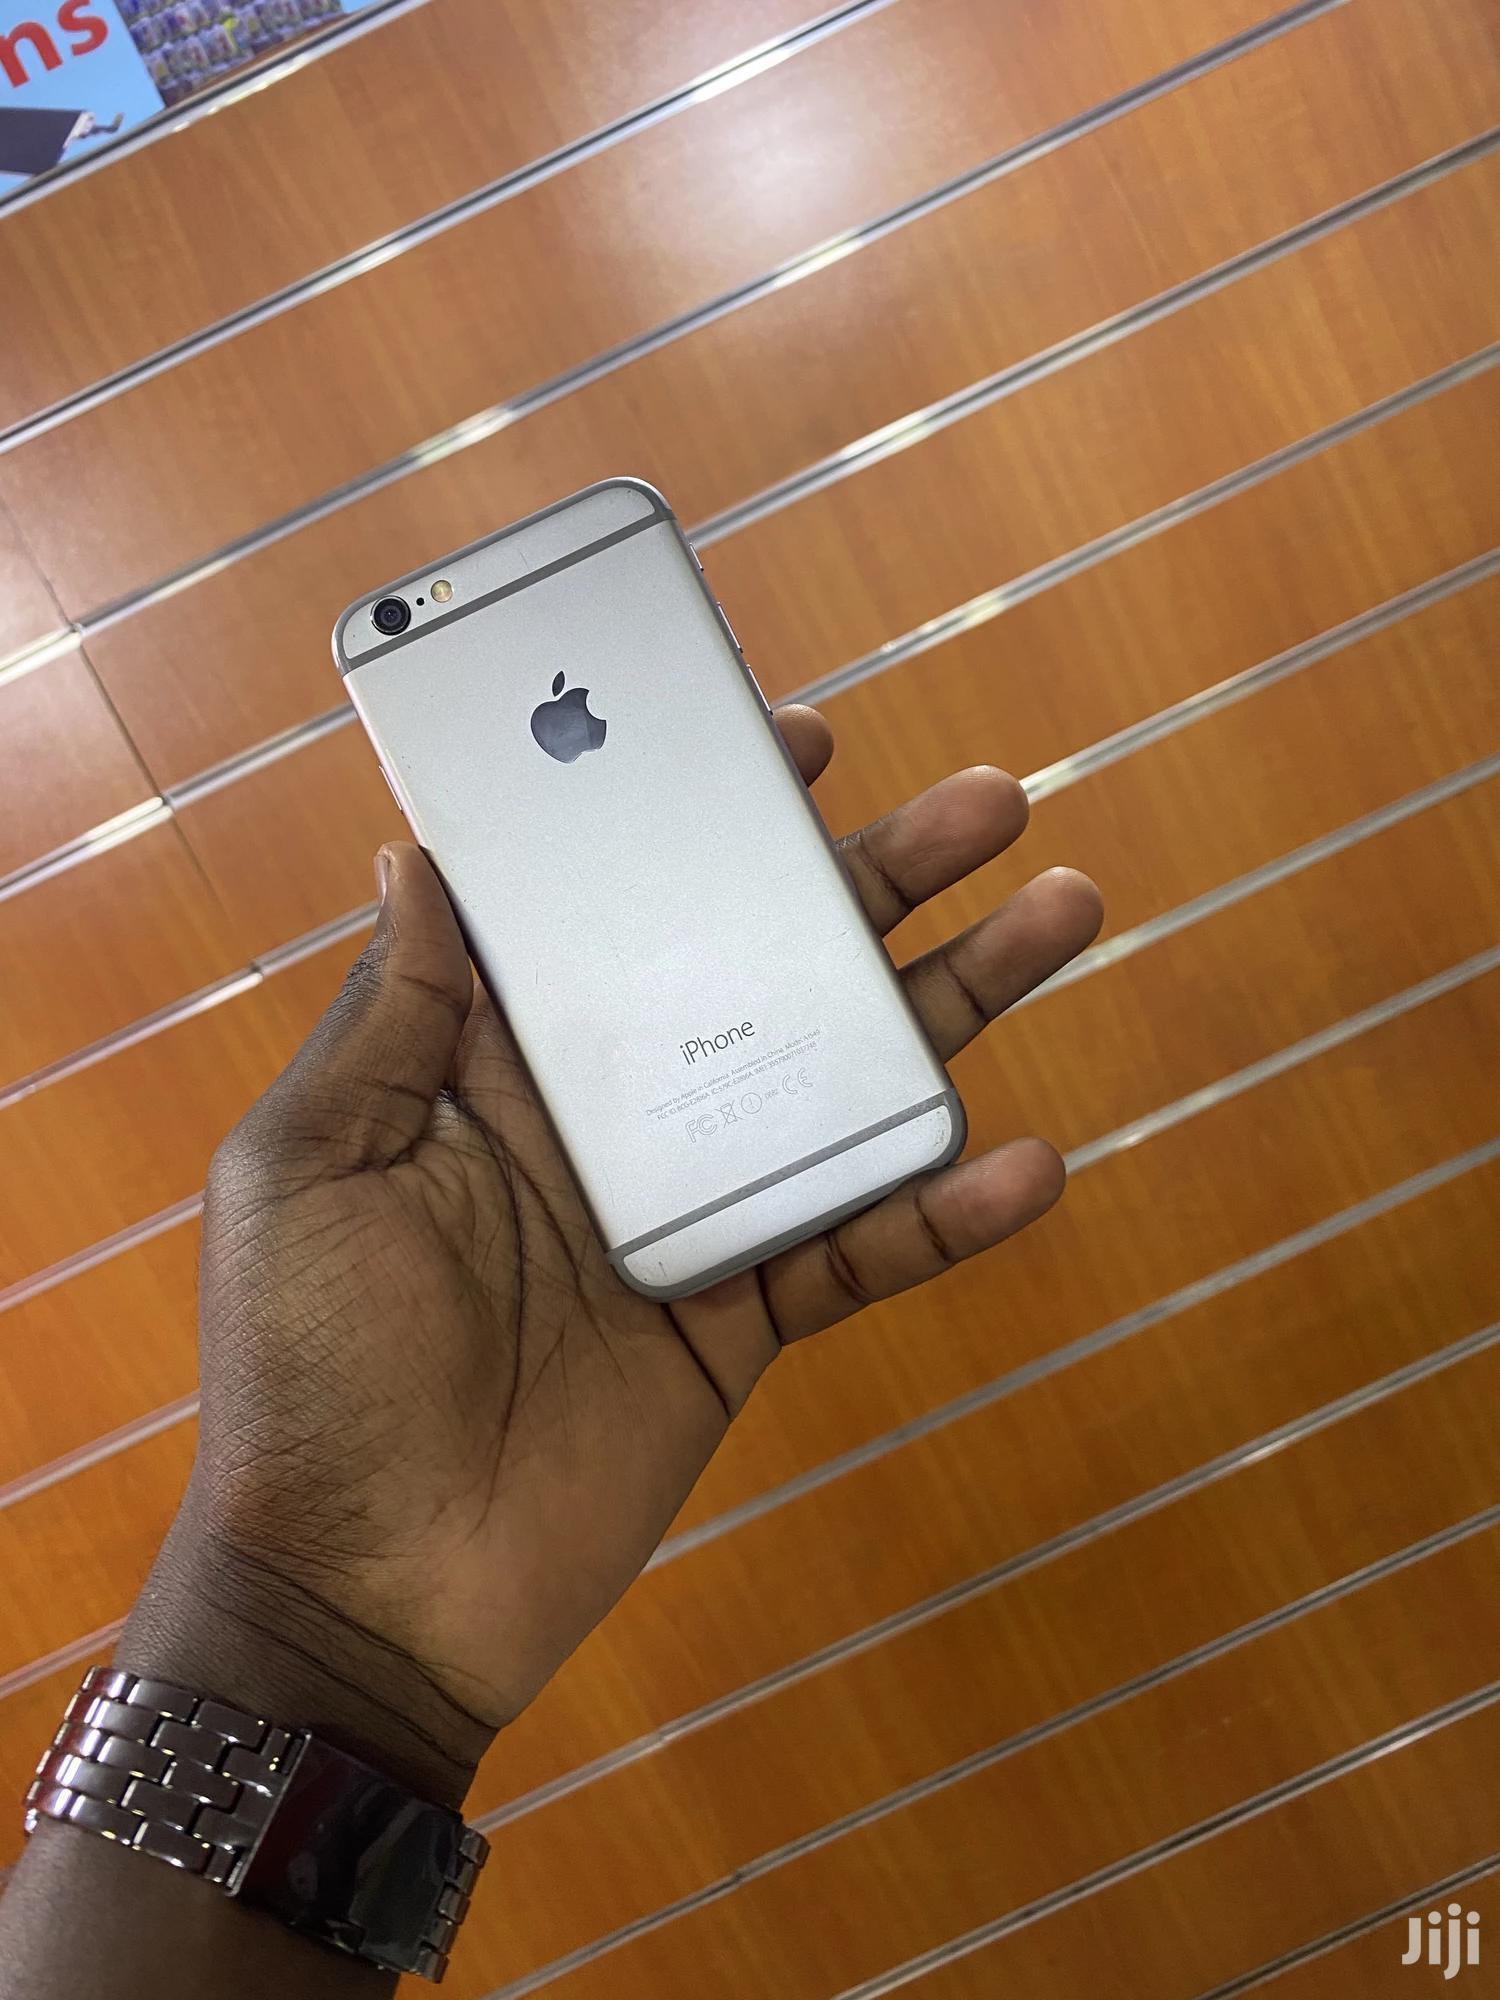 Apple iPhone 6 64 GB Gray   Mobile Phones for sale in Kampala, Central Region, Uganda